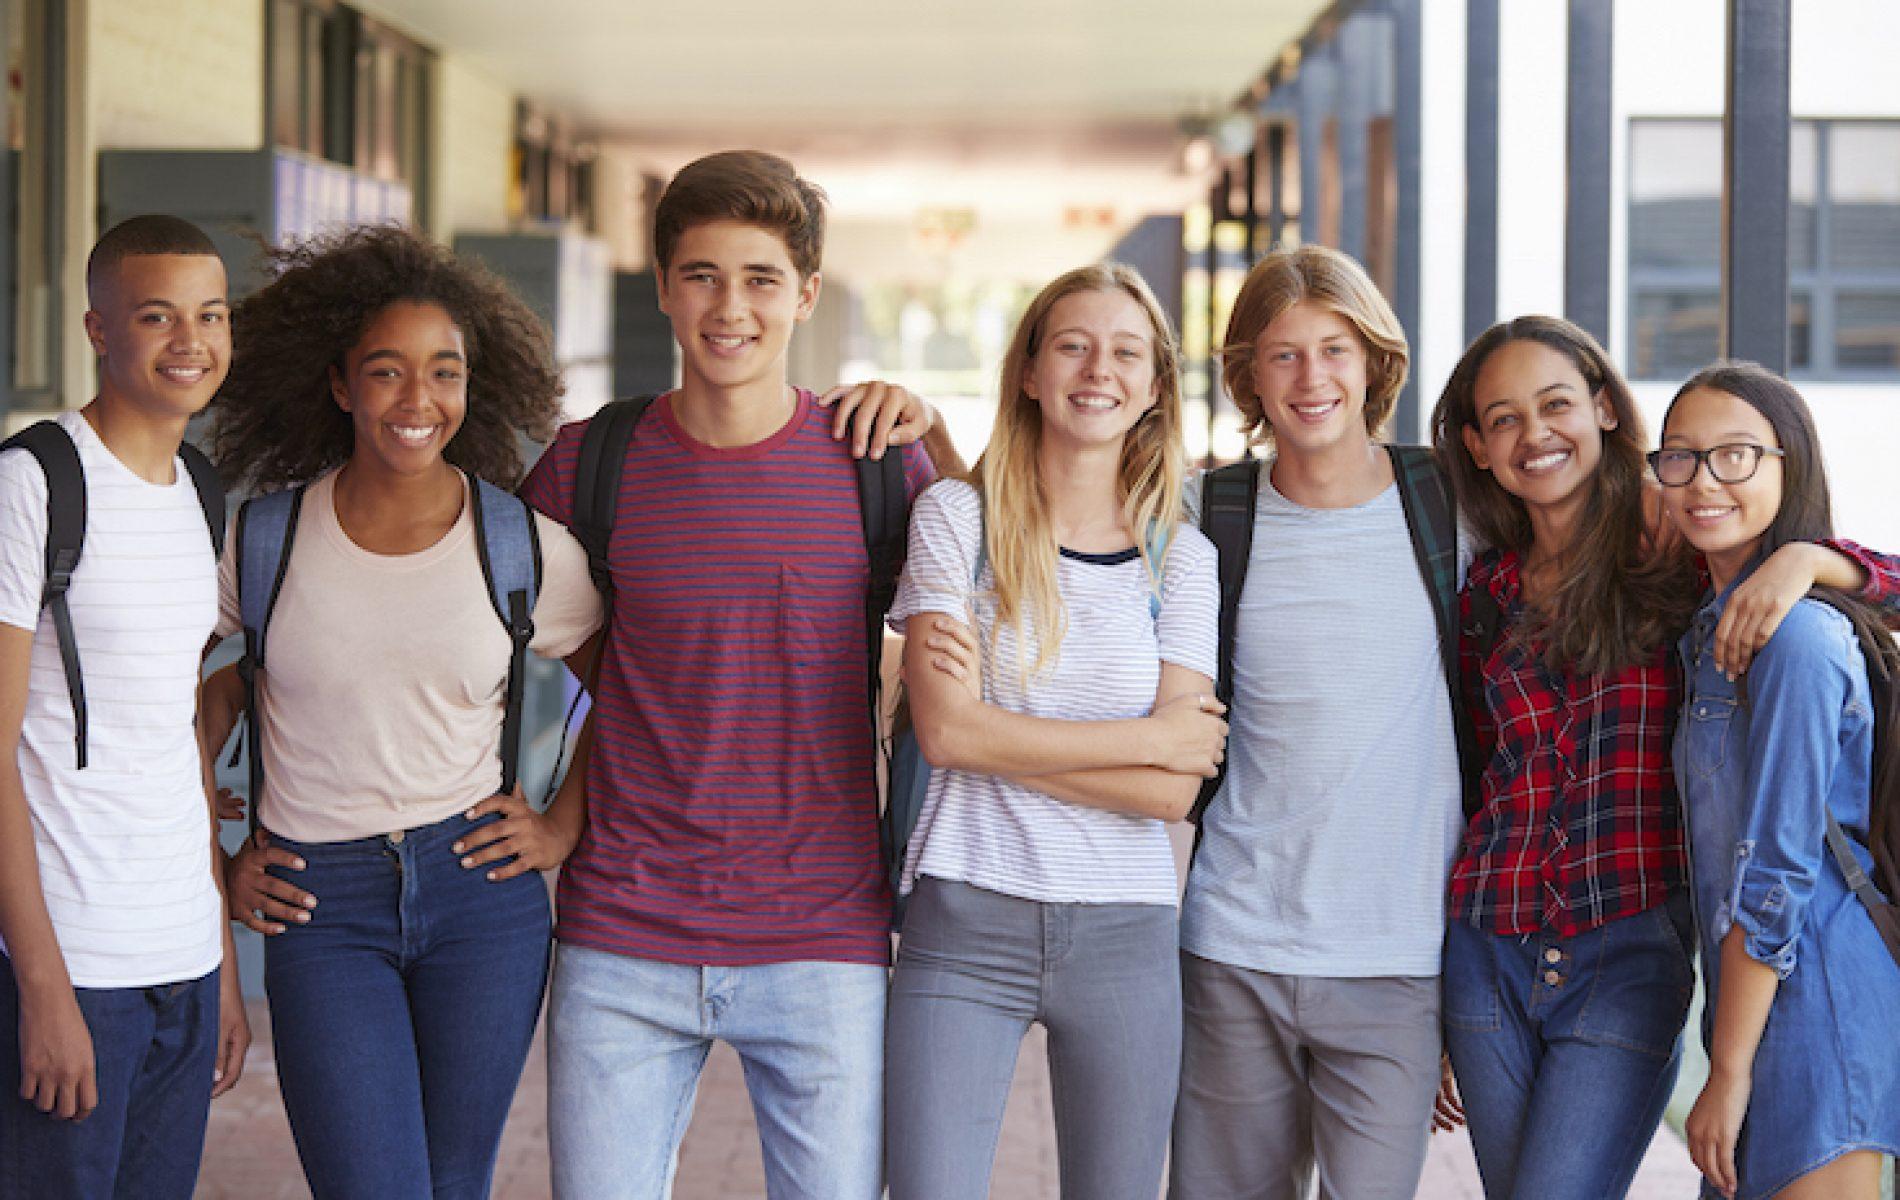 teenagers brains grow